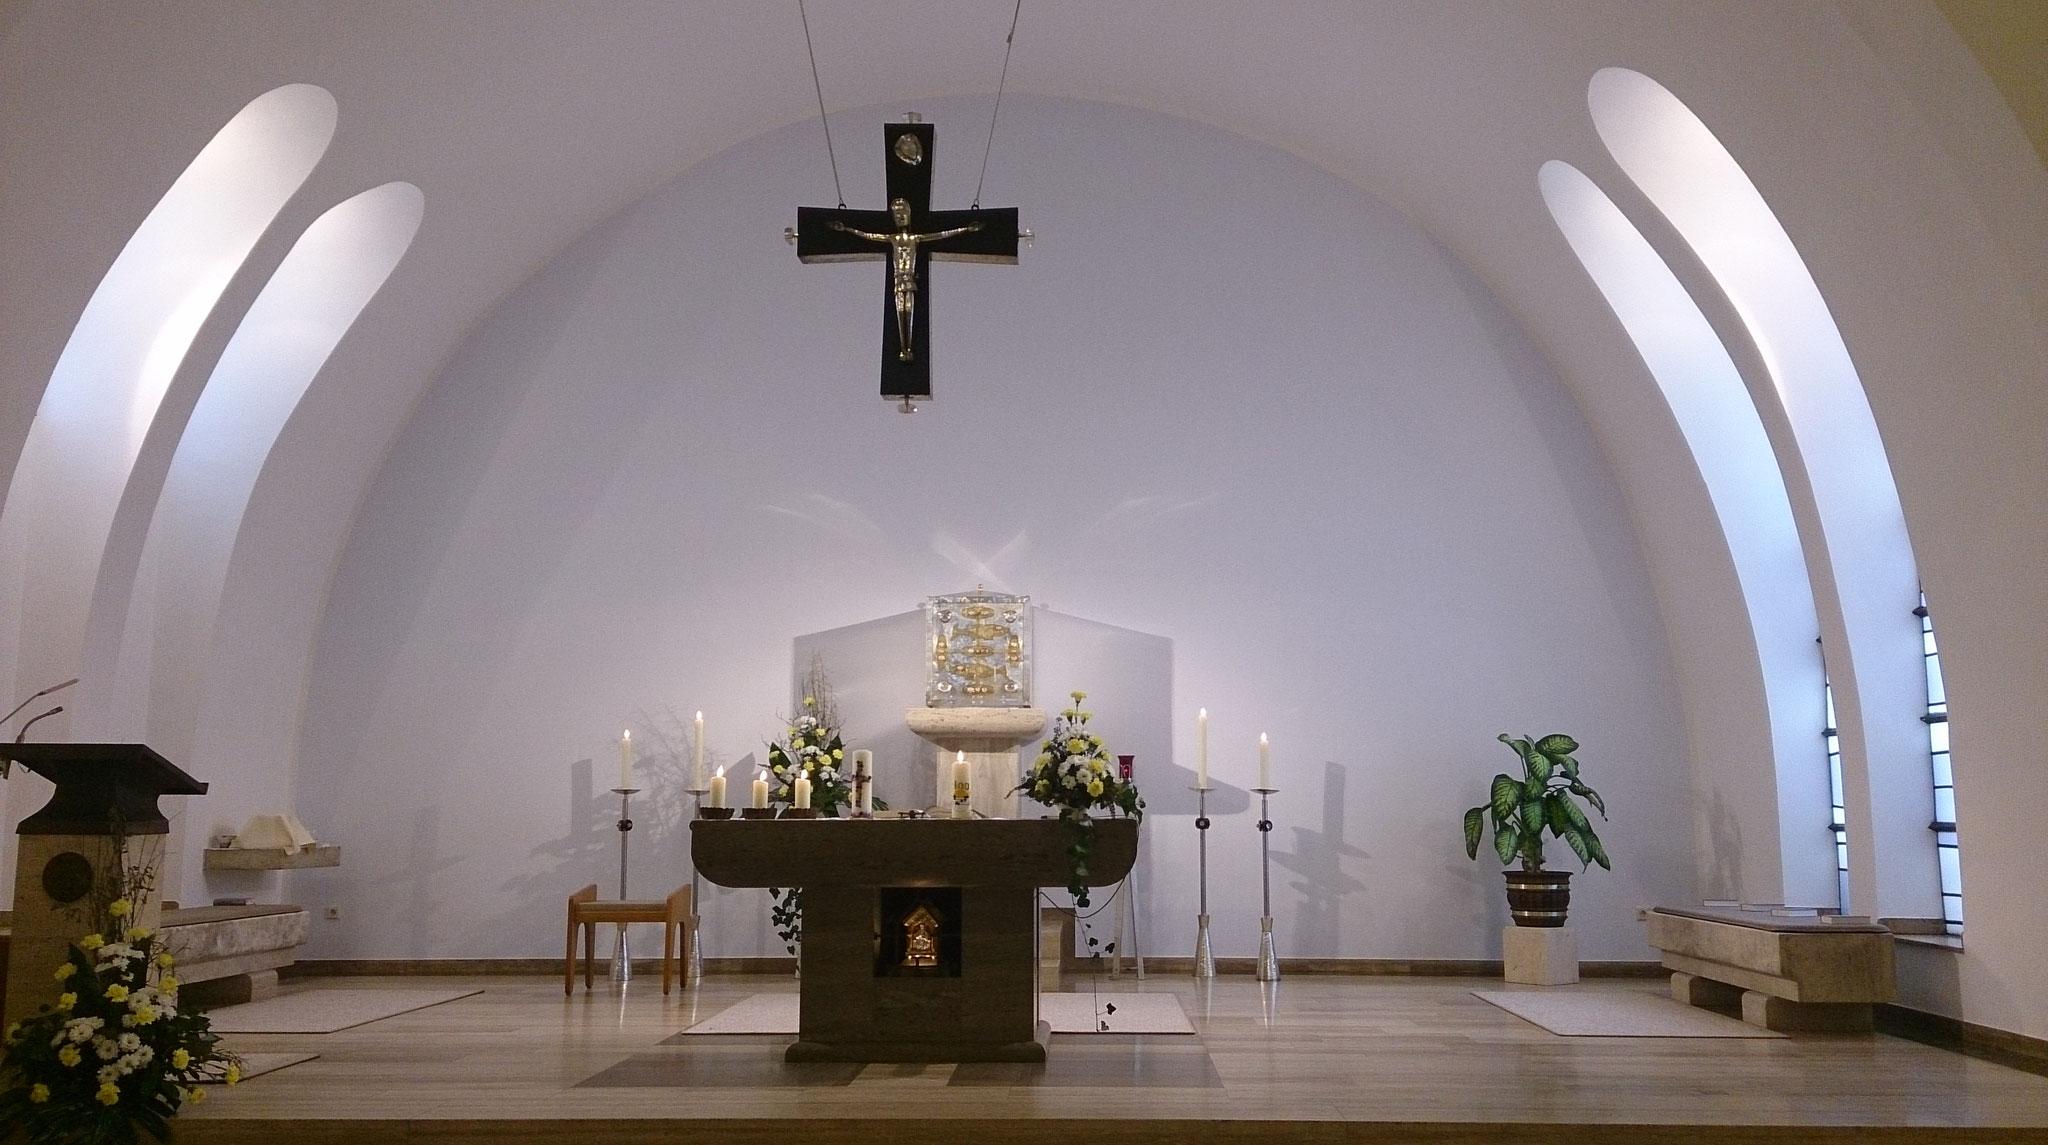 Kirche St. Suitbert, Wanheim (Foto: privat)